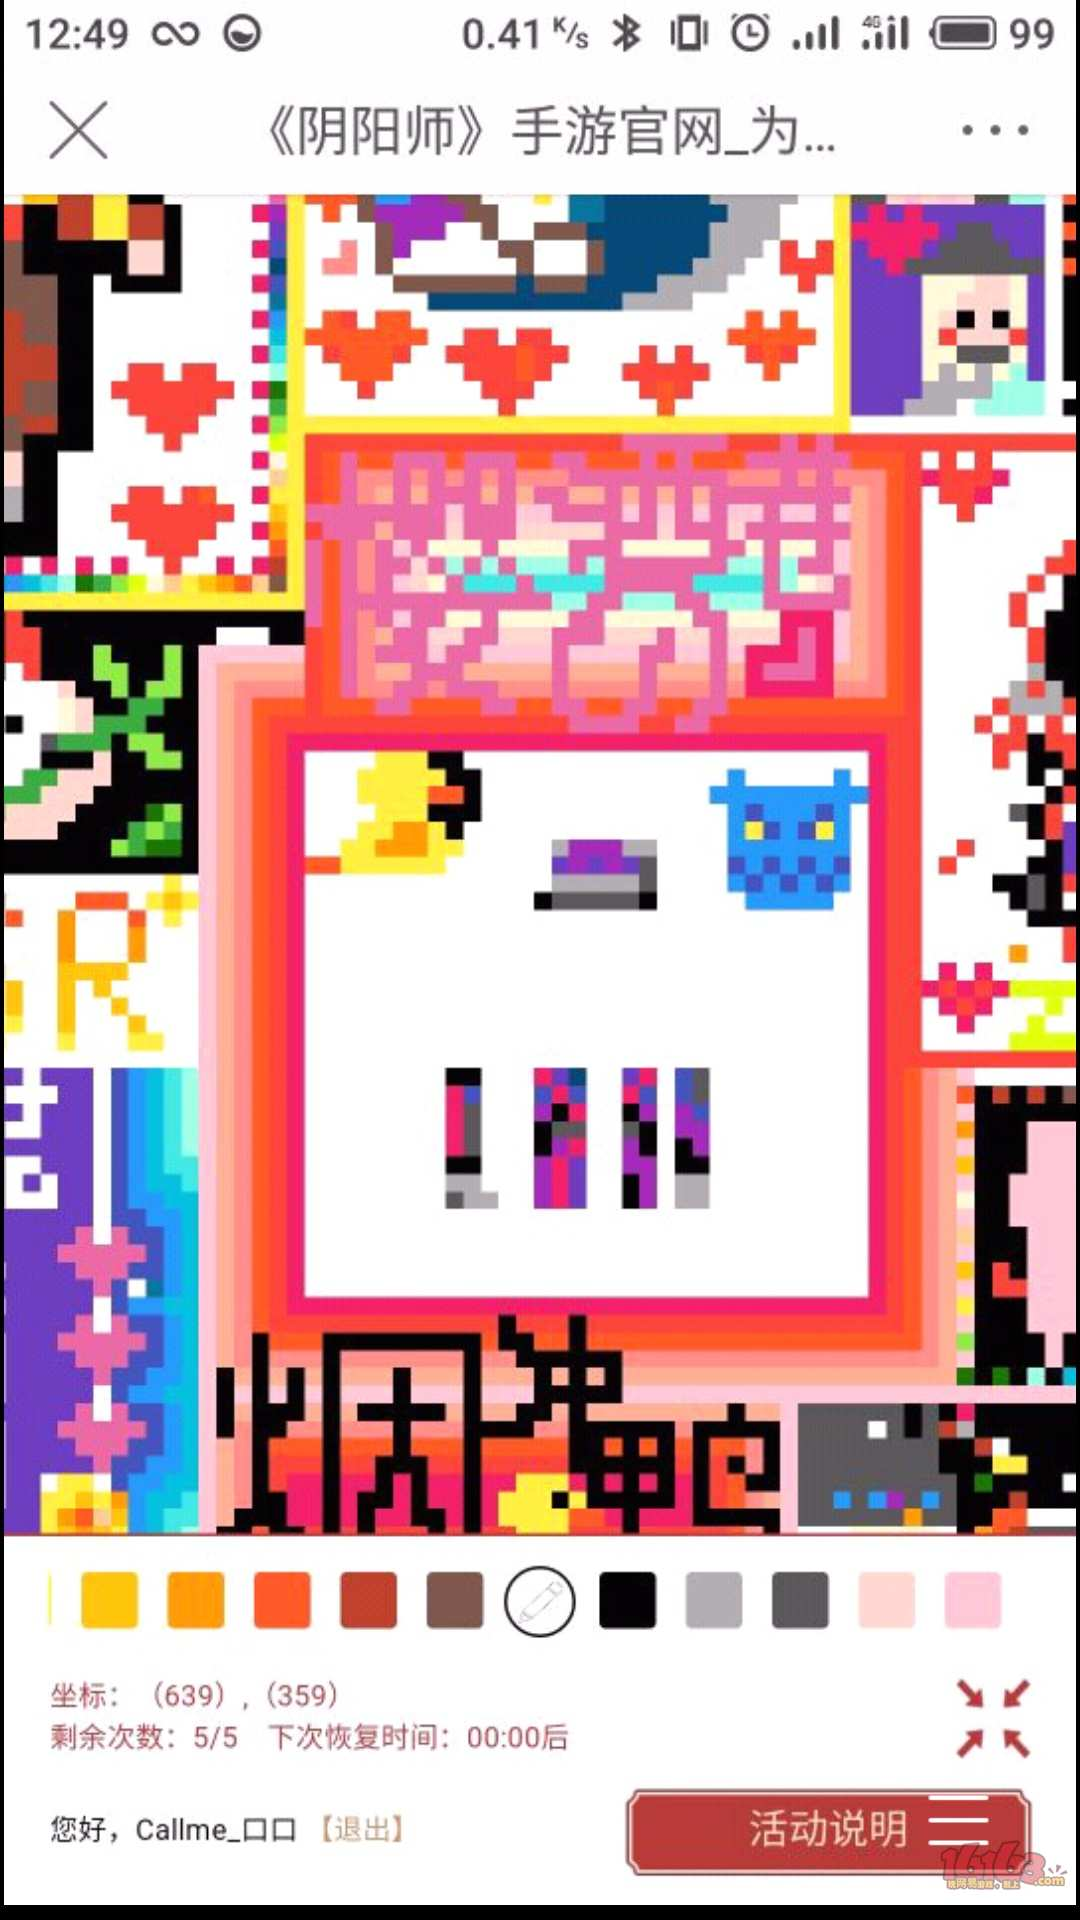 S90113-13022561.jpg